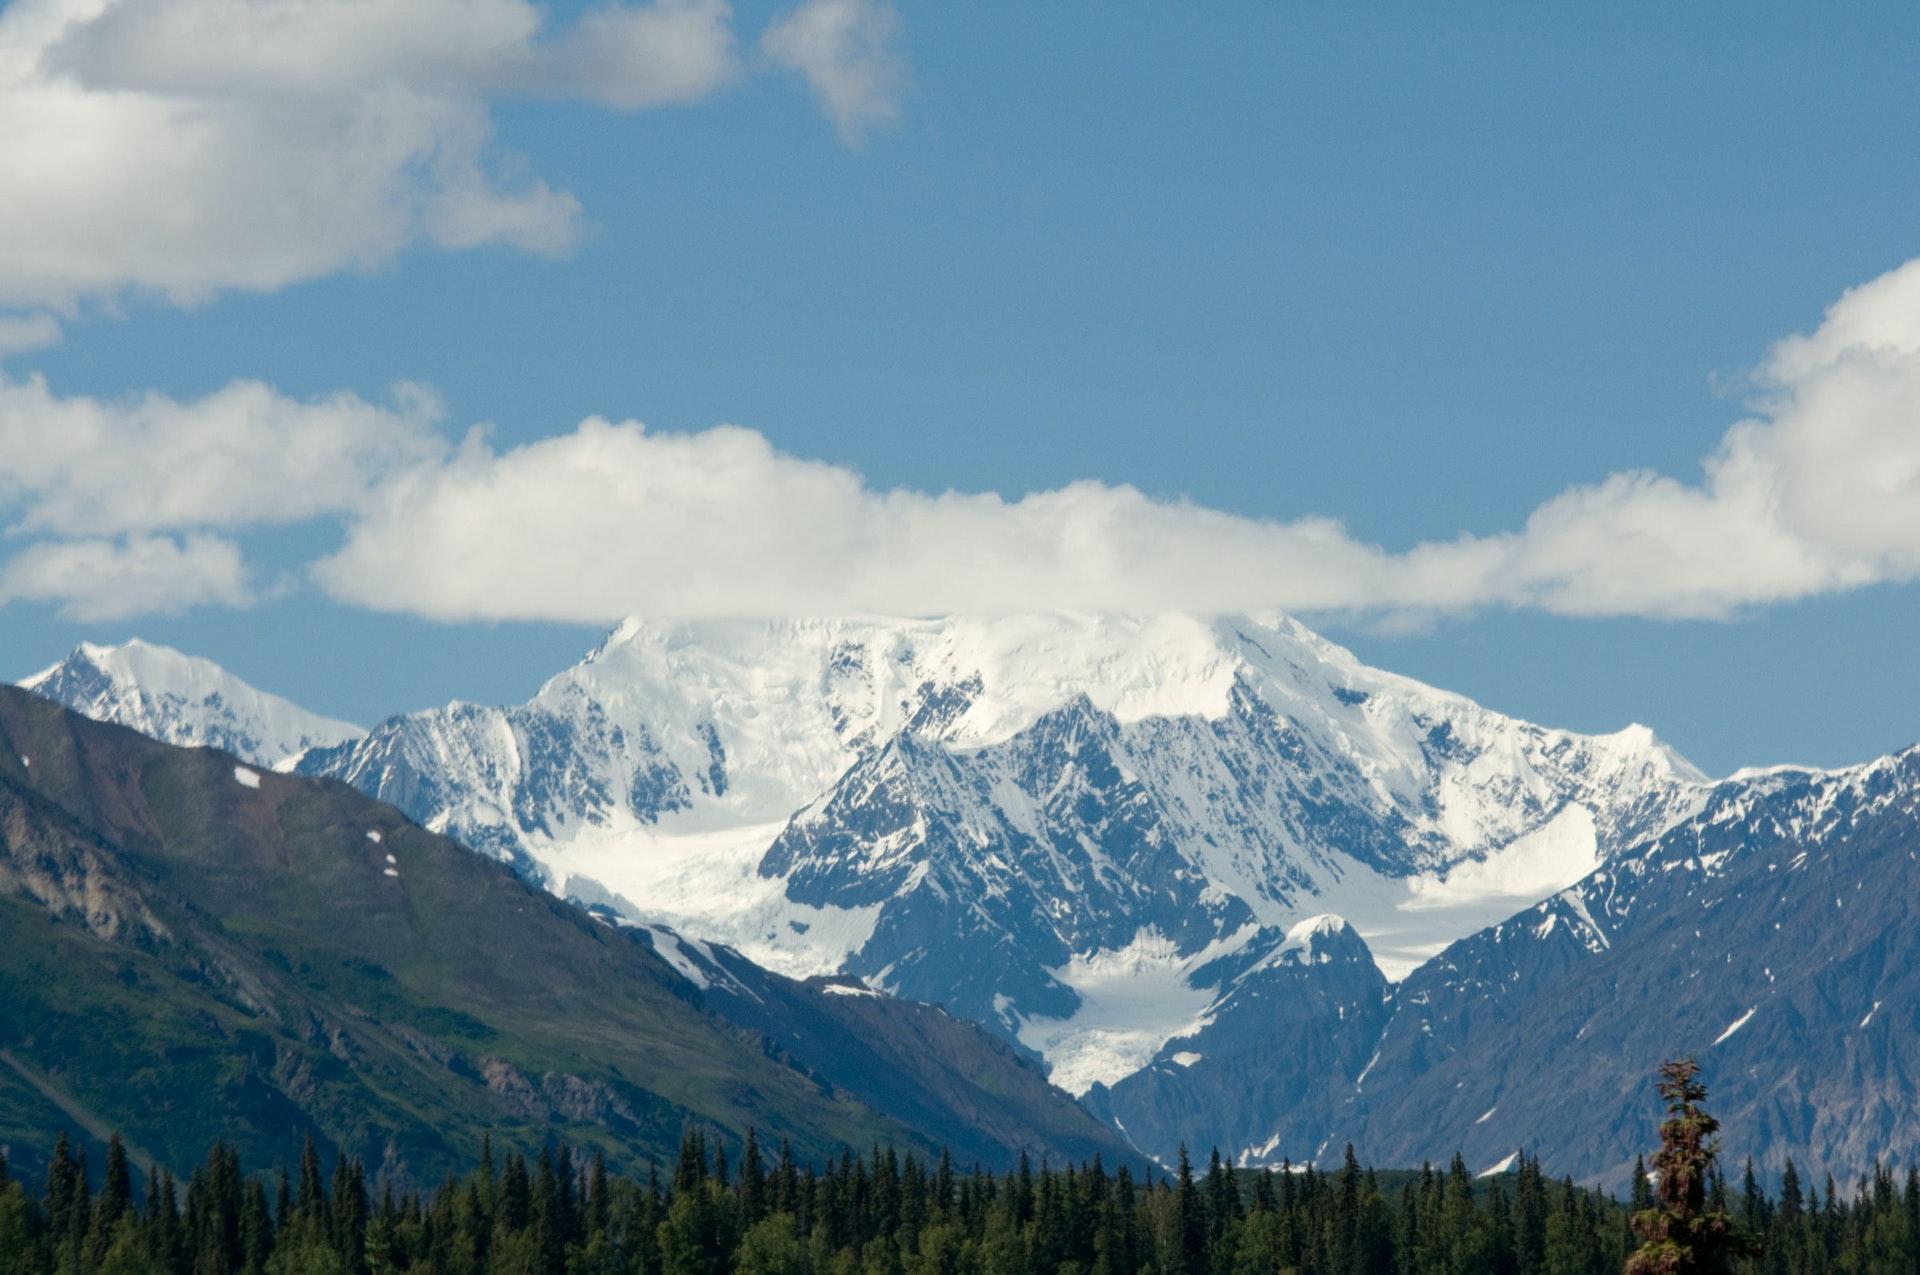 Denali State Park, an Alaska park